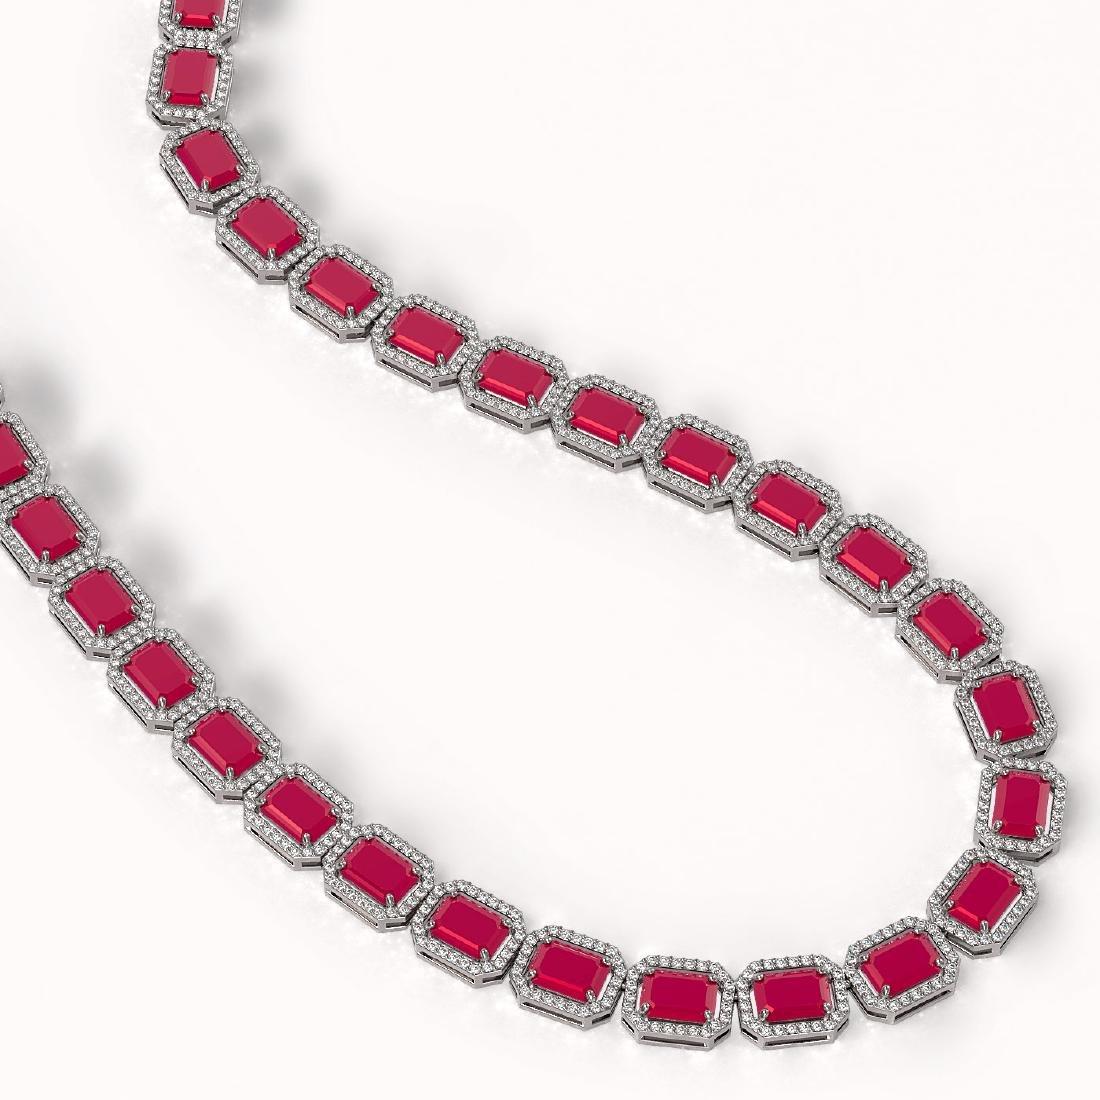 58.59 CTW Ruby & Diamond Halo Necklace 10K White Gold - 2